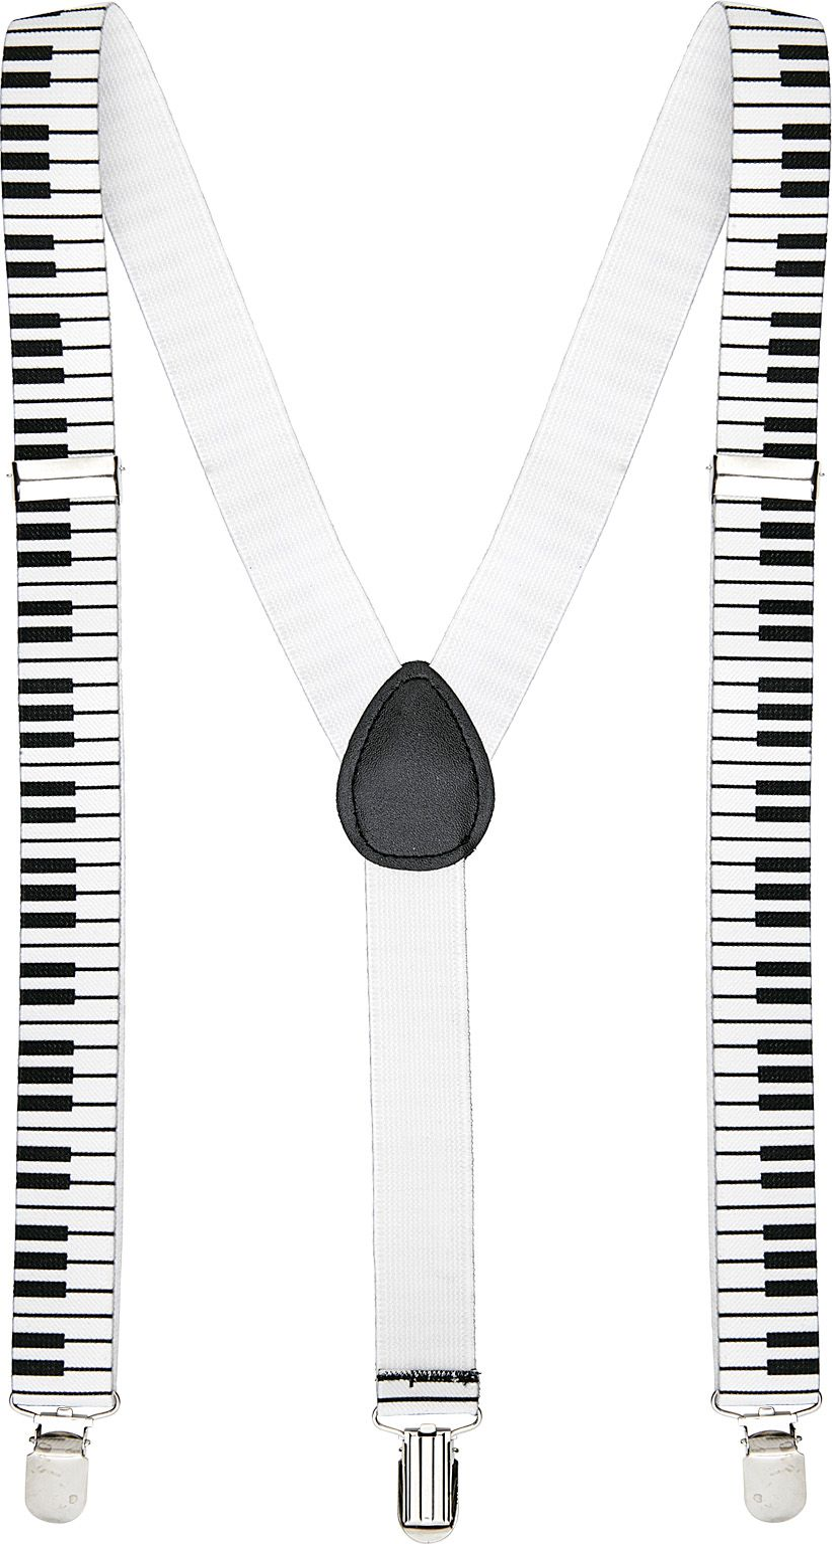 Witte piano bretels